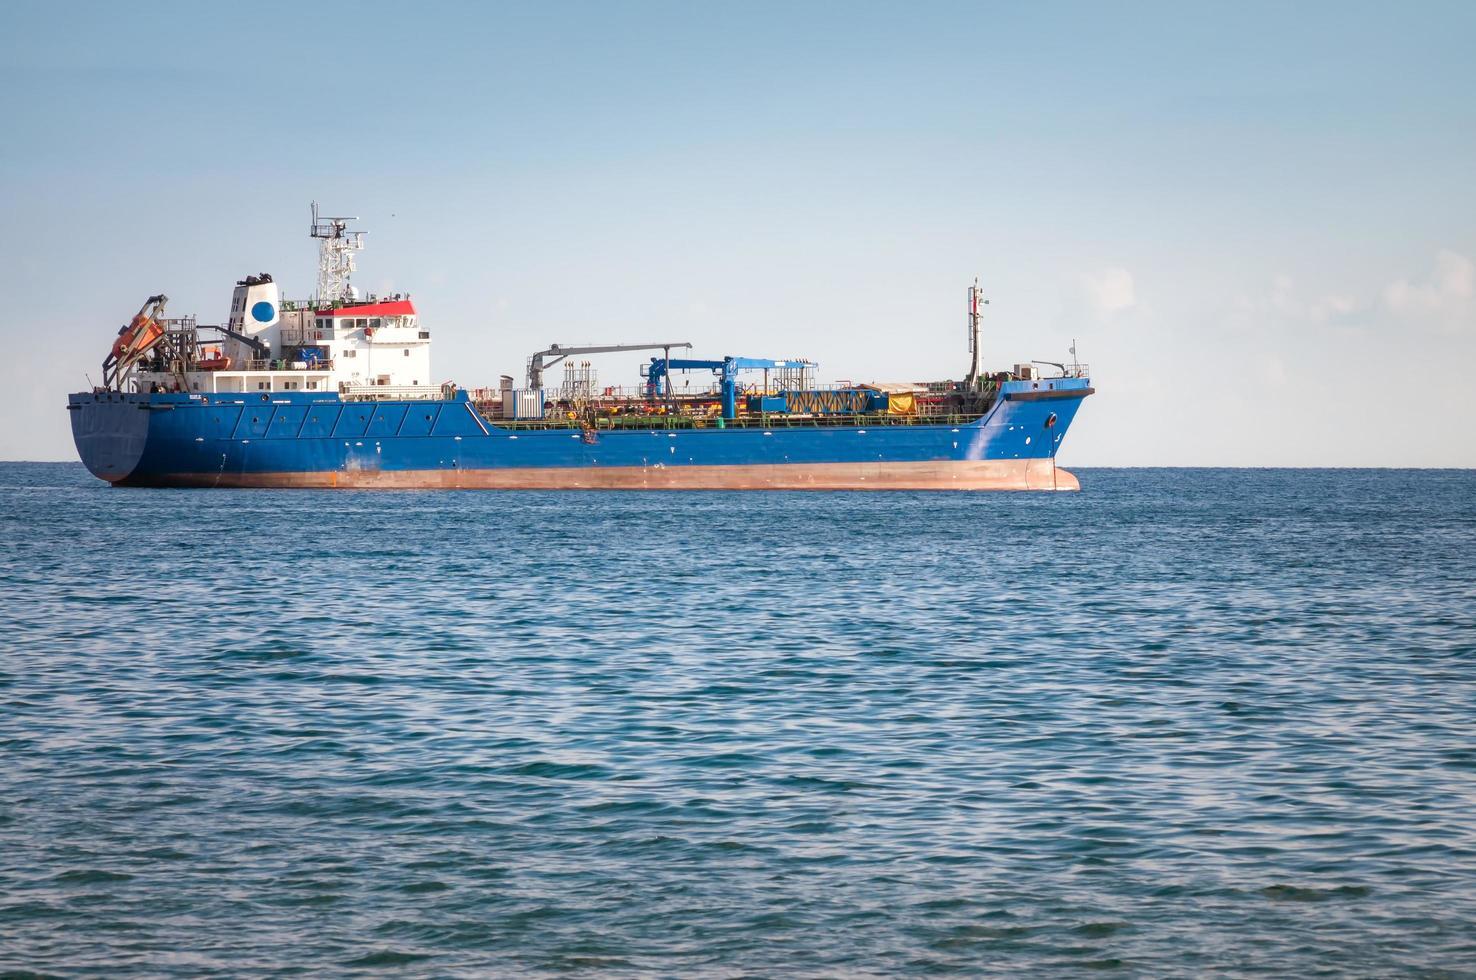 Navire industriel inconnu en mer méditerranée photo